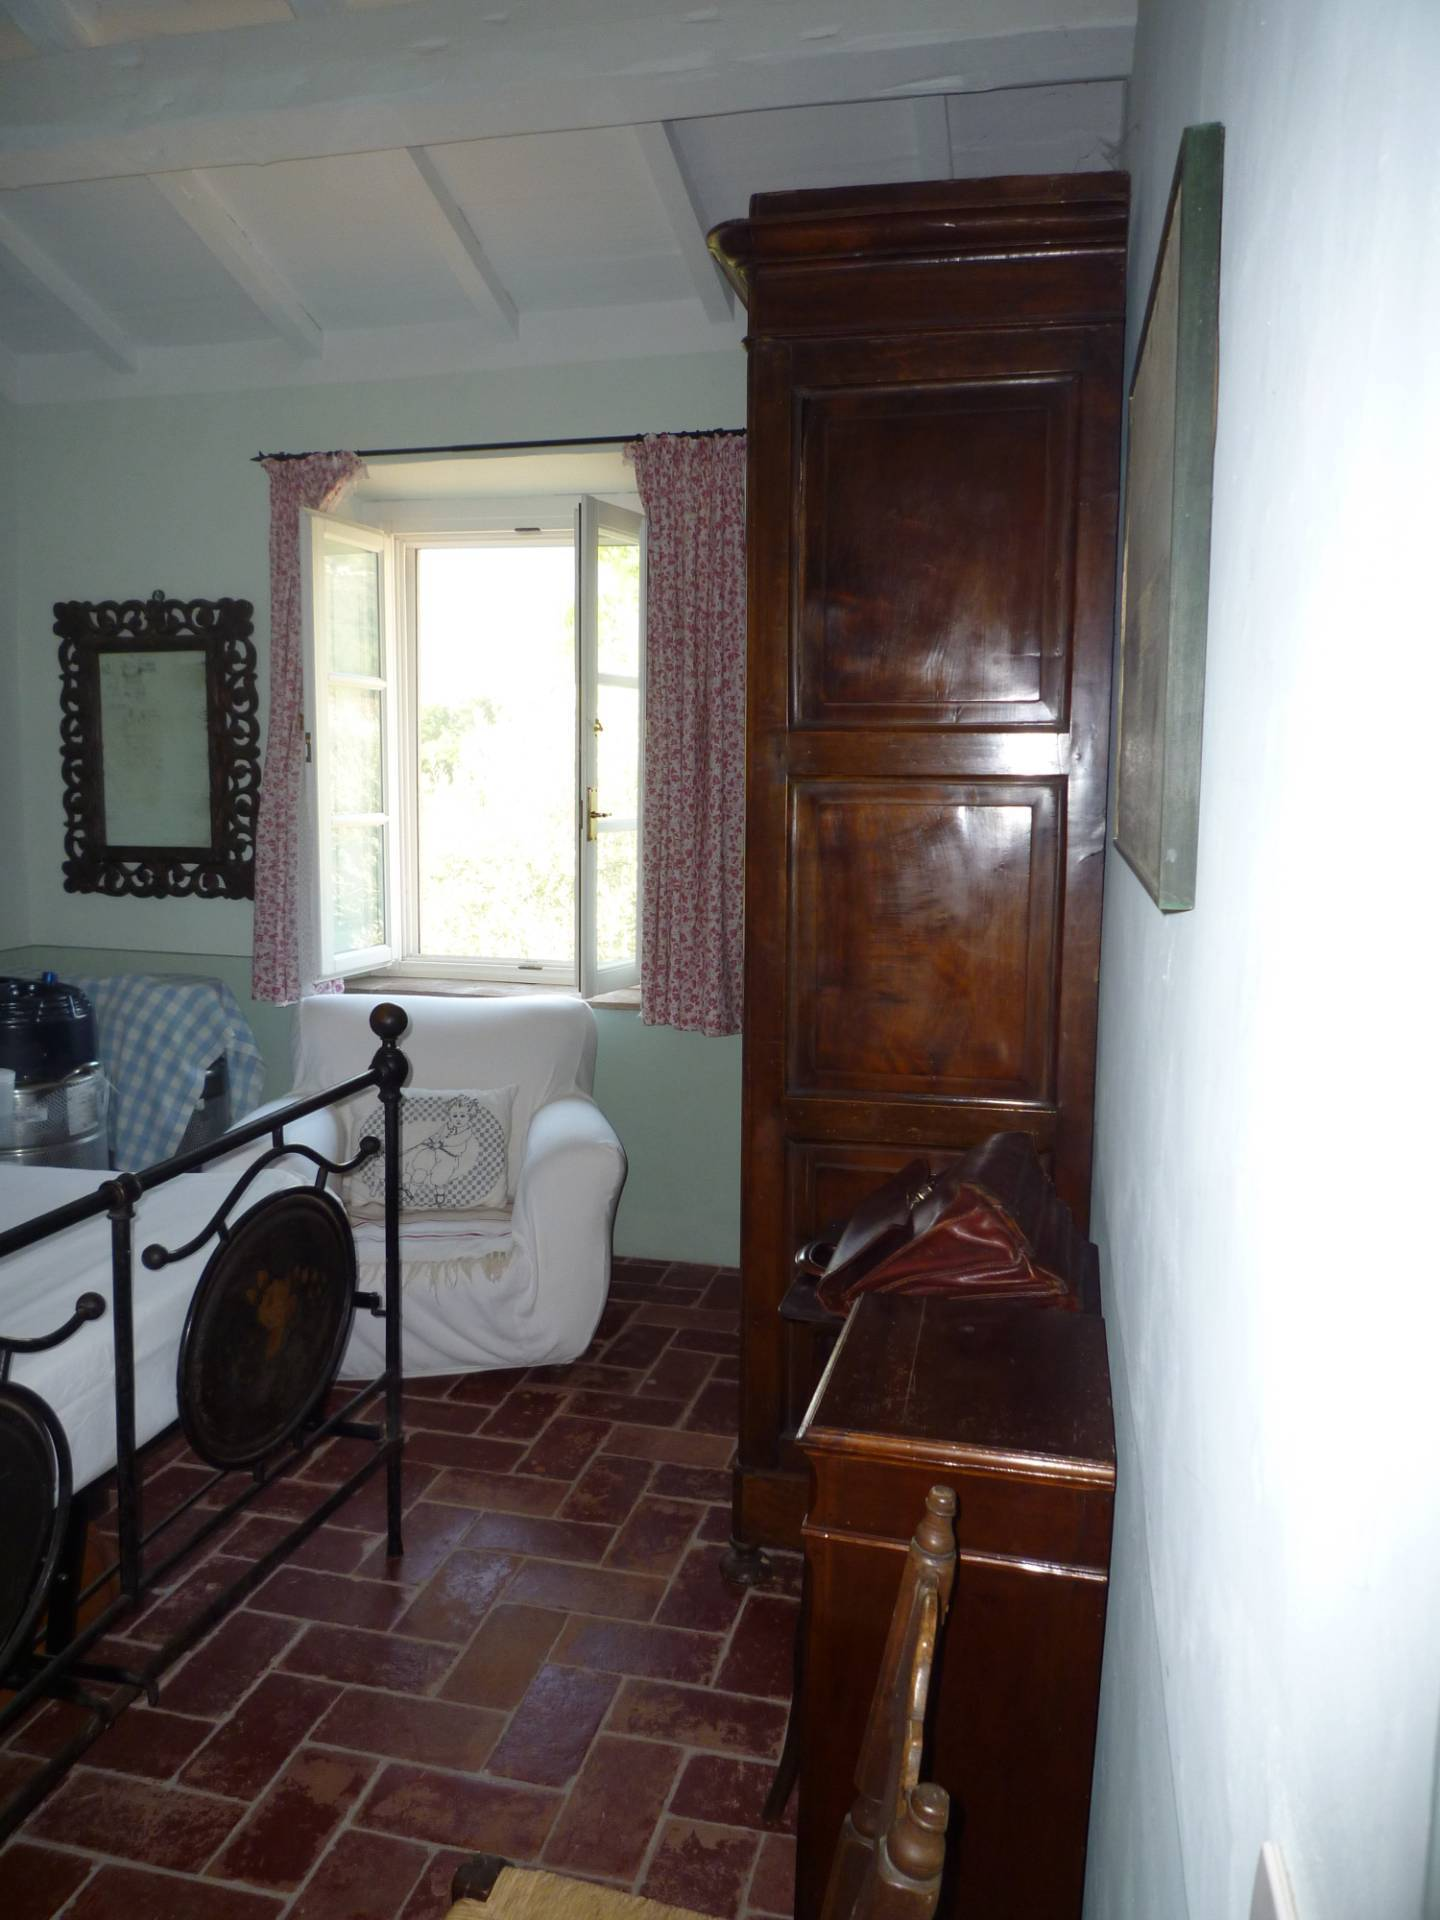 Villa in Vendita a Camaiore: 5 locali, 120 mq - Foto 27